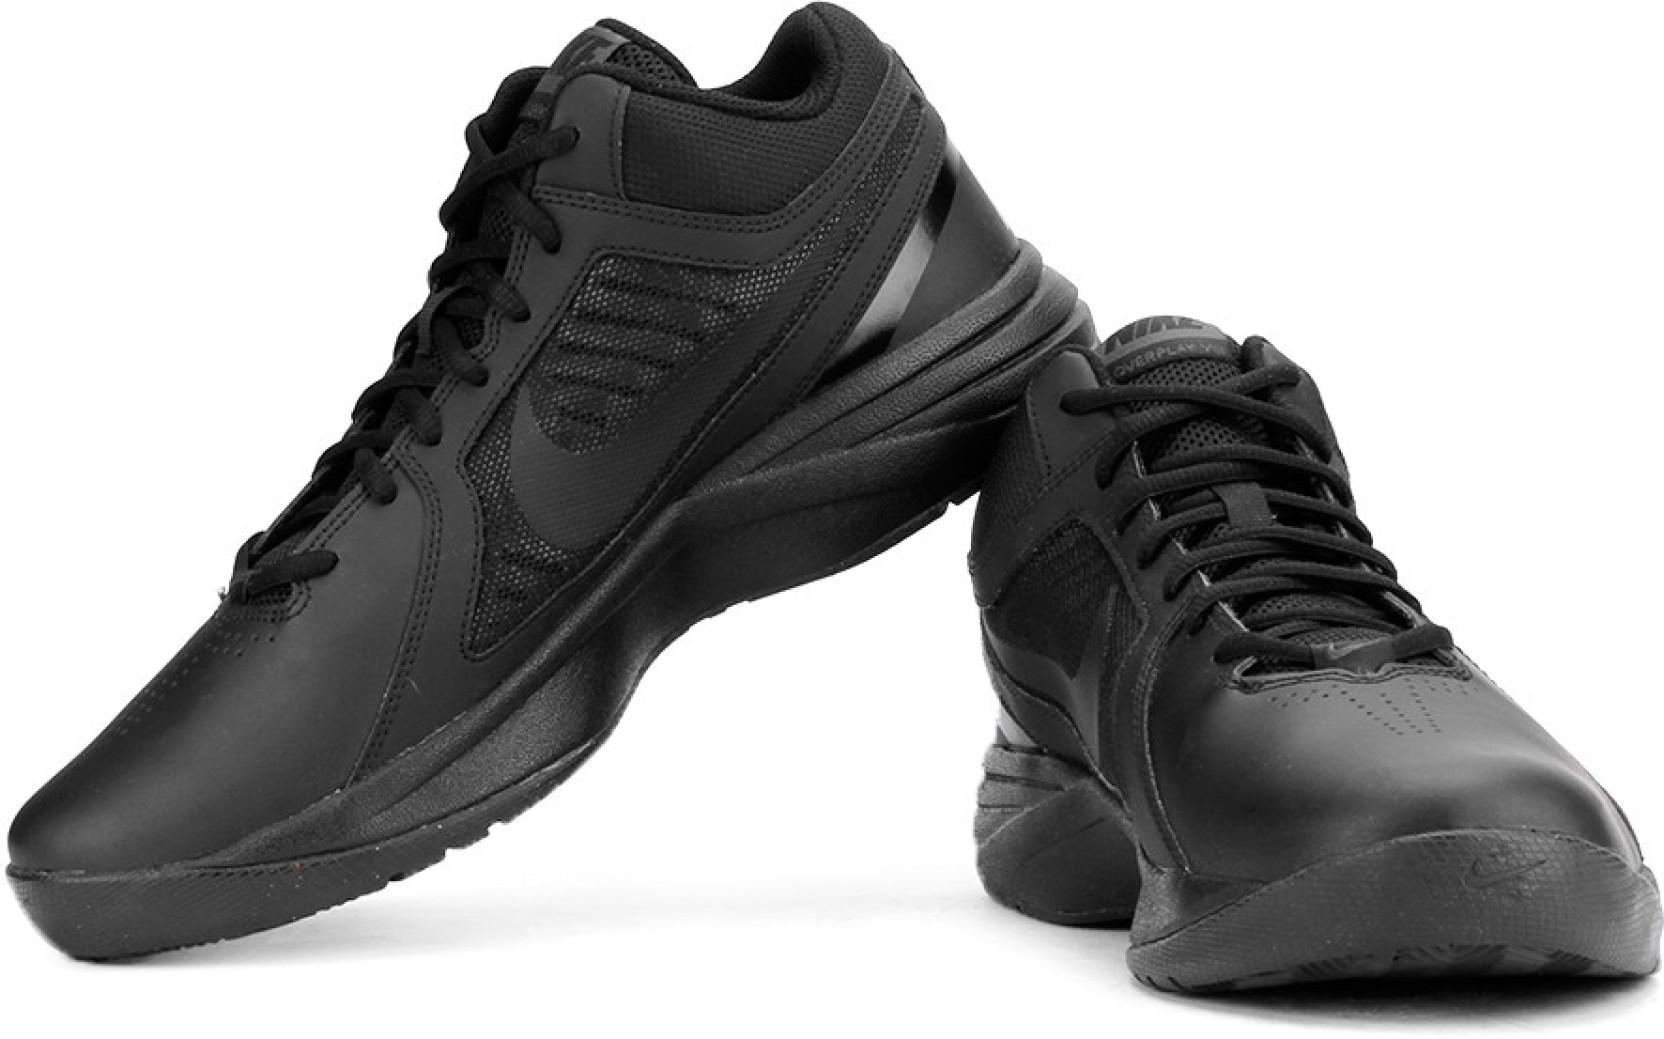 Nike The Overplay Viii Basketball Shoes India